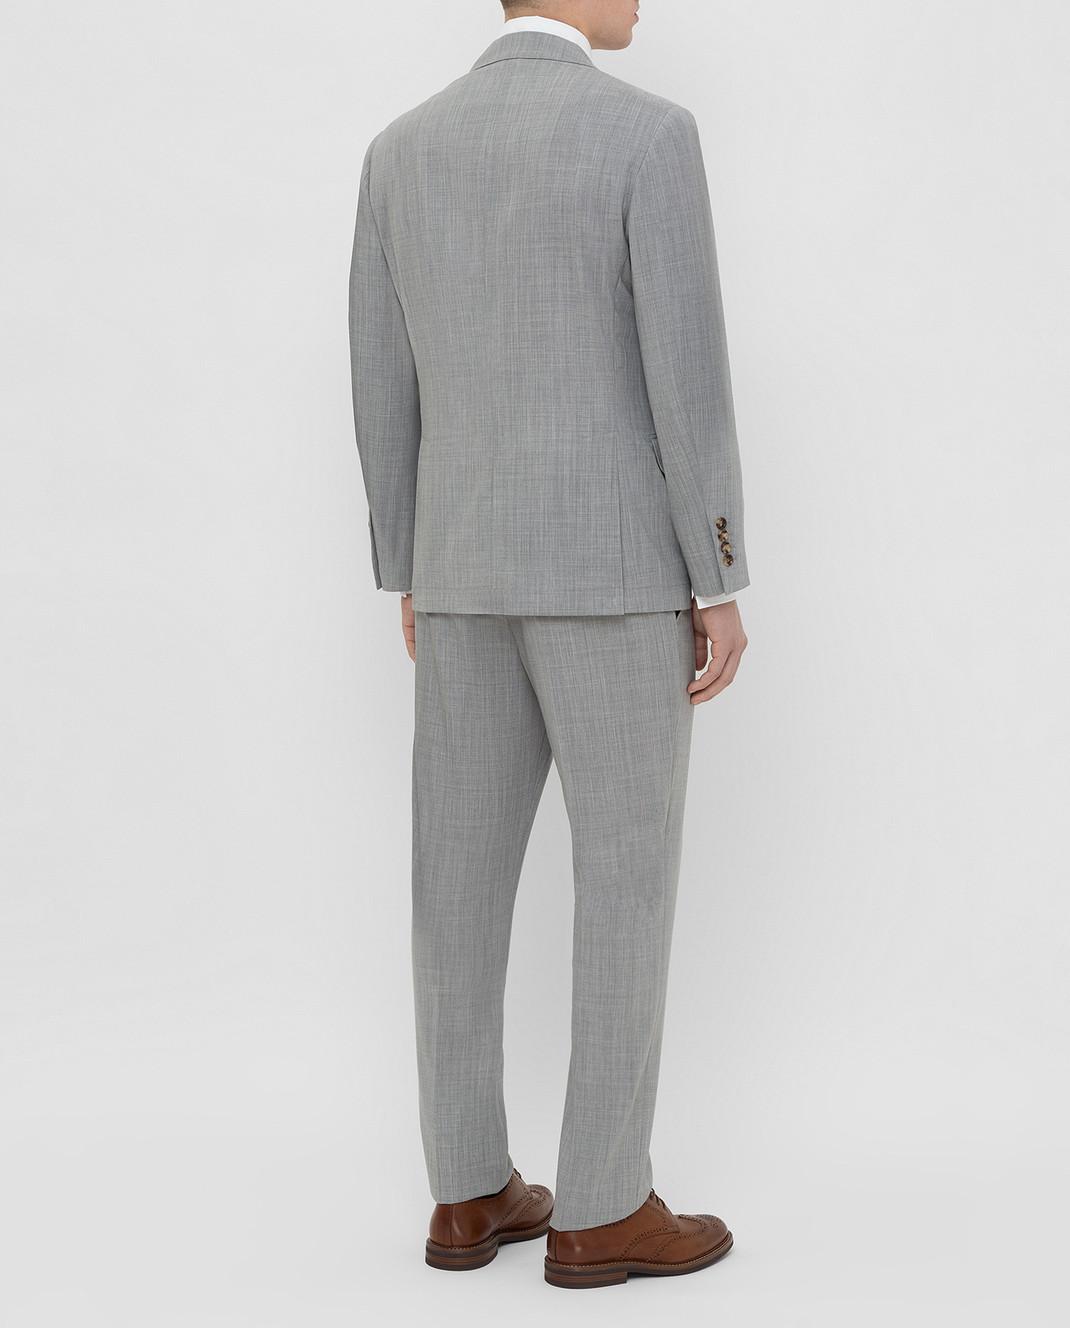 Brunello Cucinelli Серый костюм из шерсти MD4107BT7 изображение 4